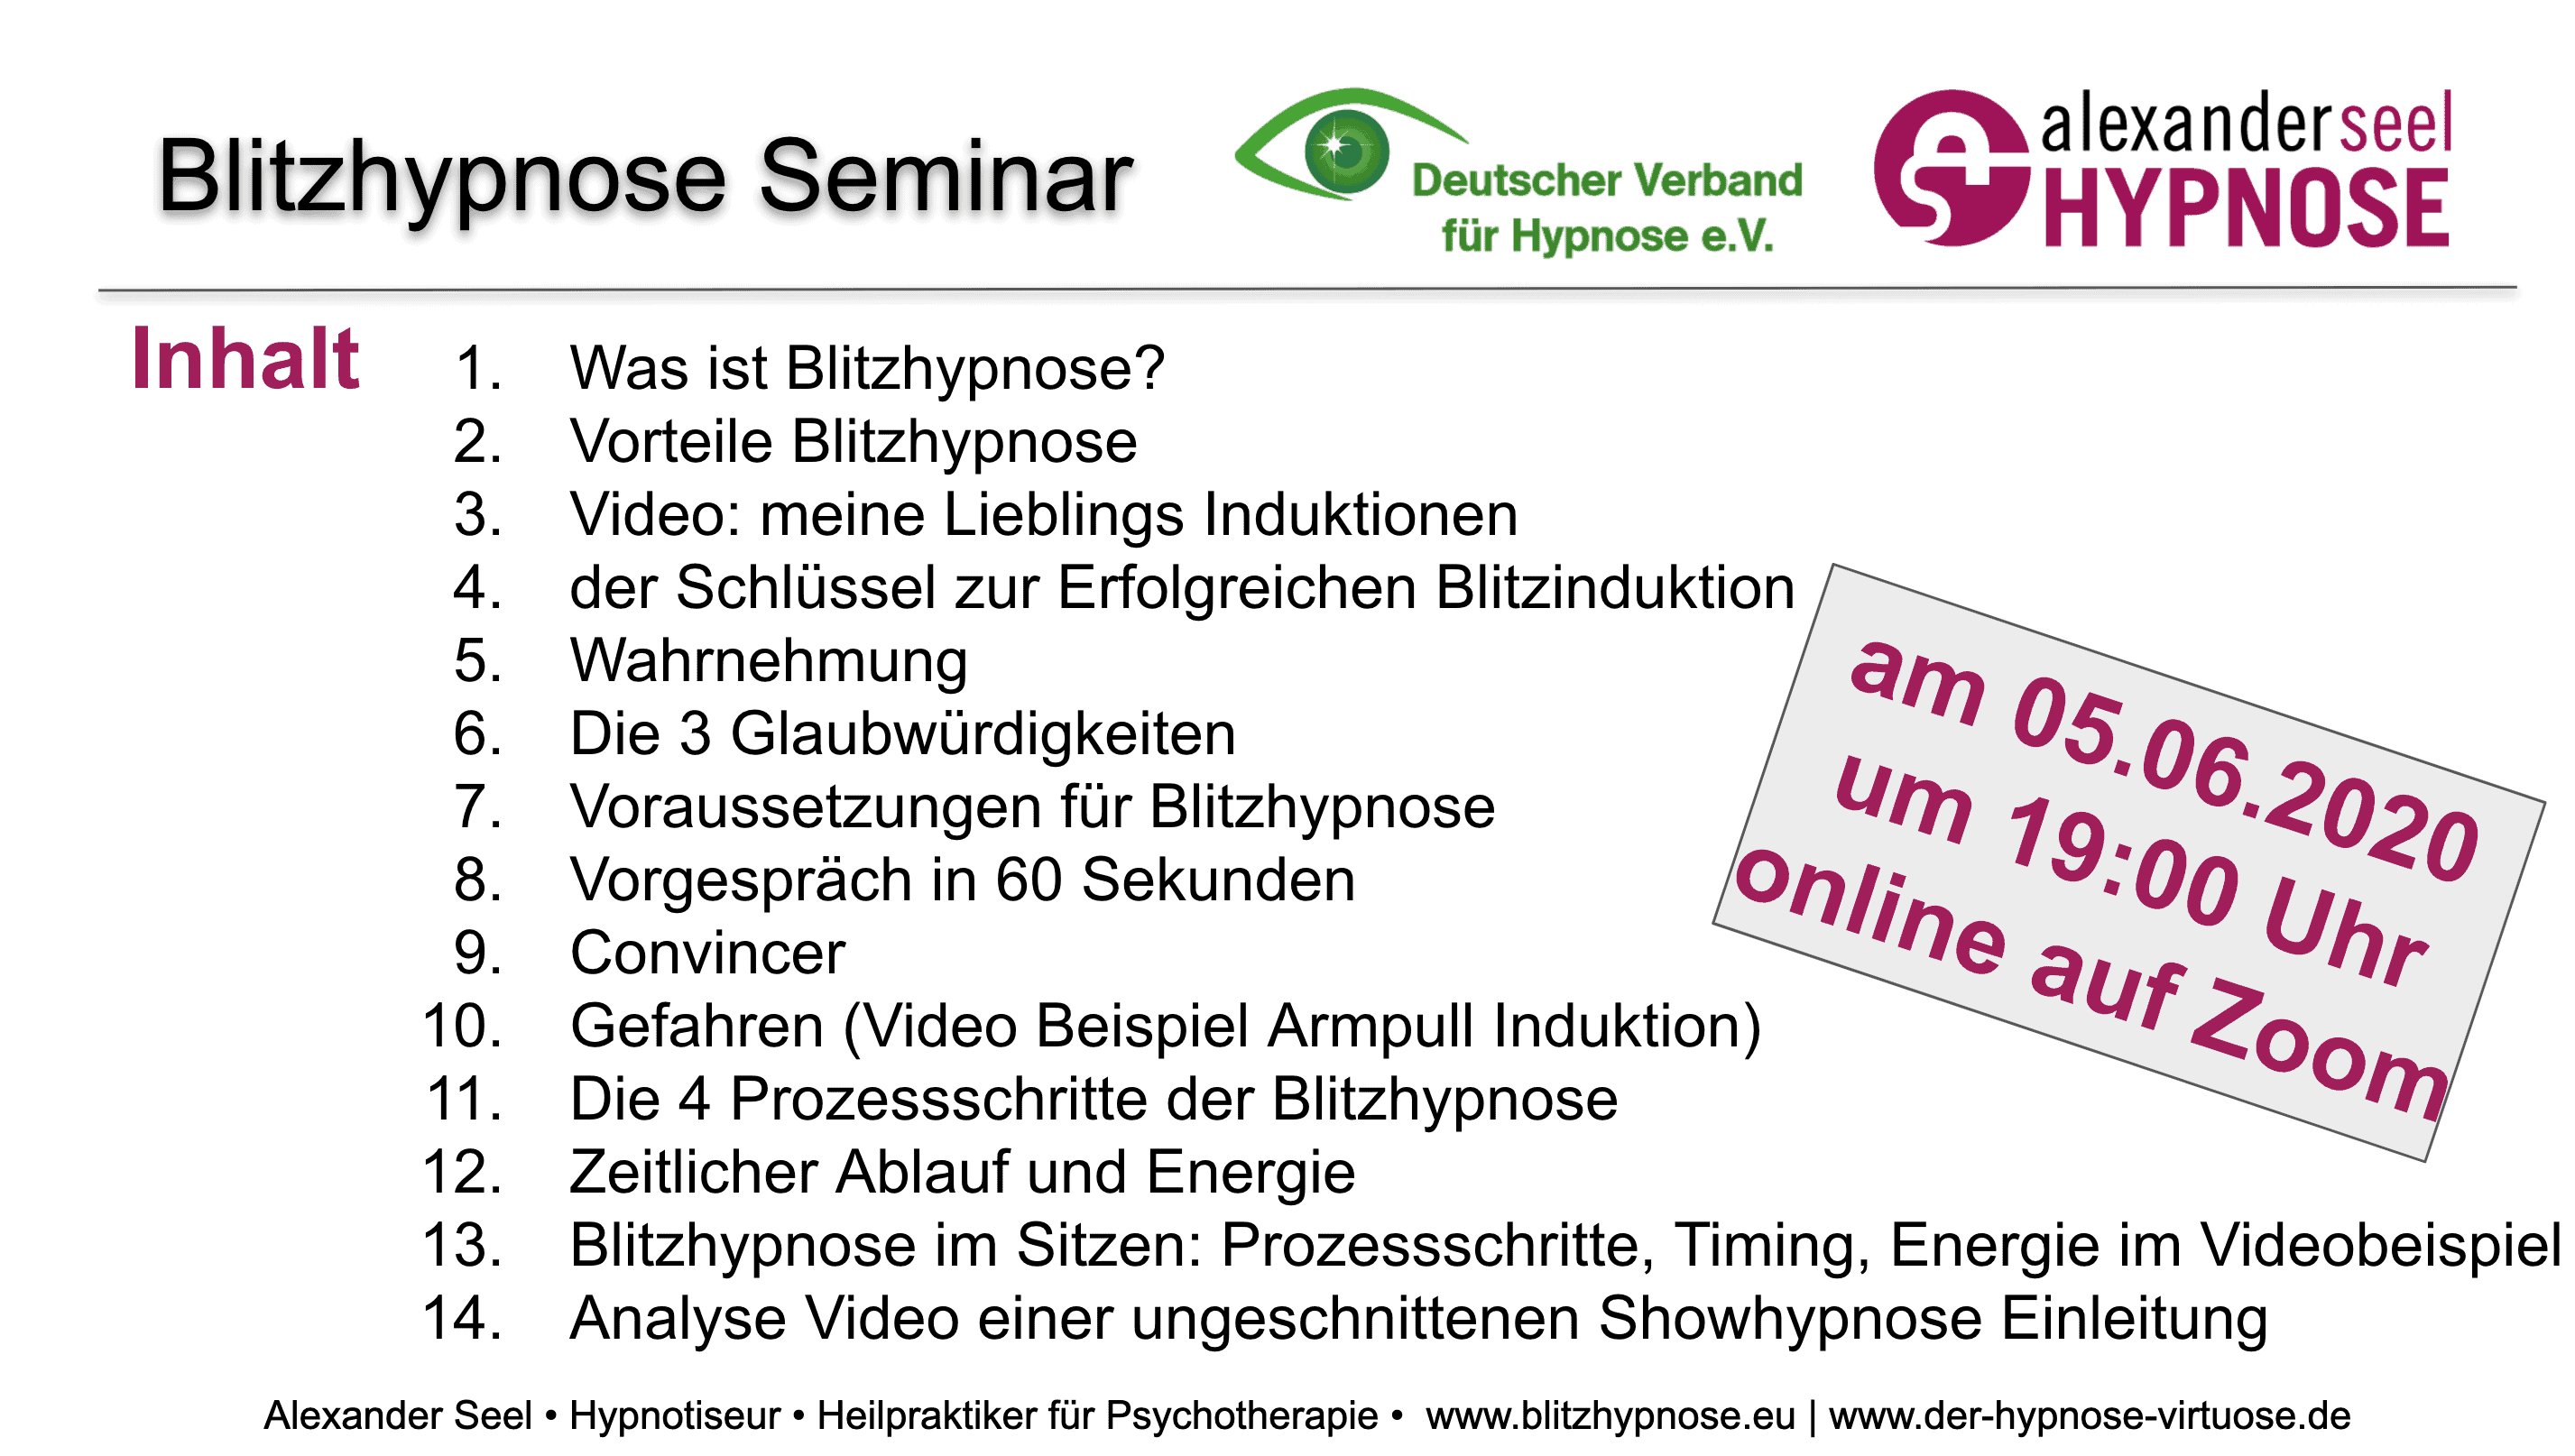 Blitzhypnose Seminar 05.06.2020 PDF-download